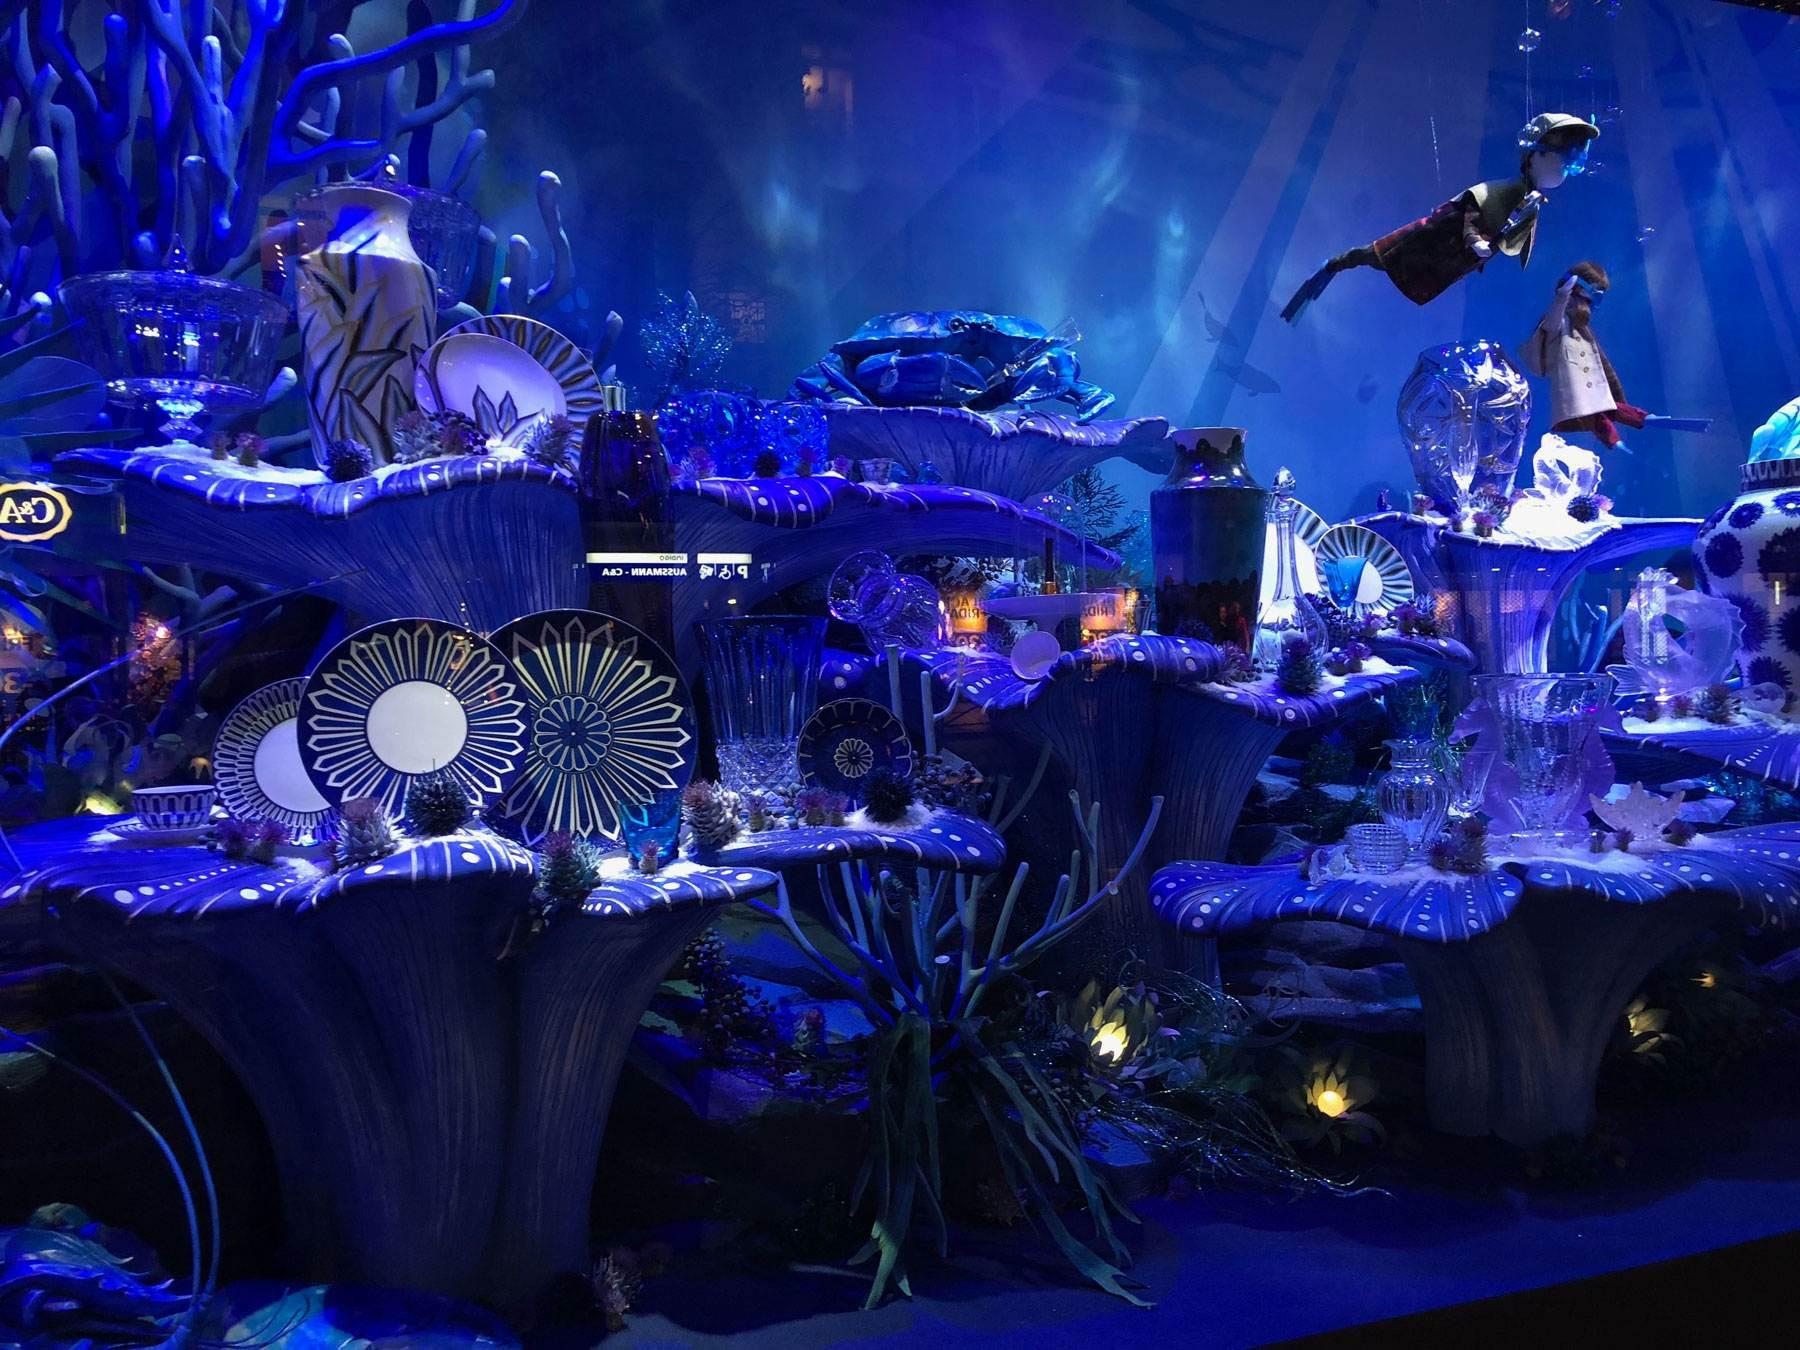 printemps-haussmann-christmas-display-blue